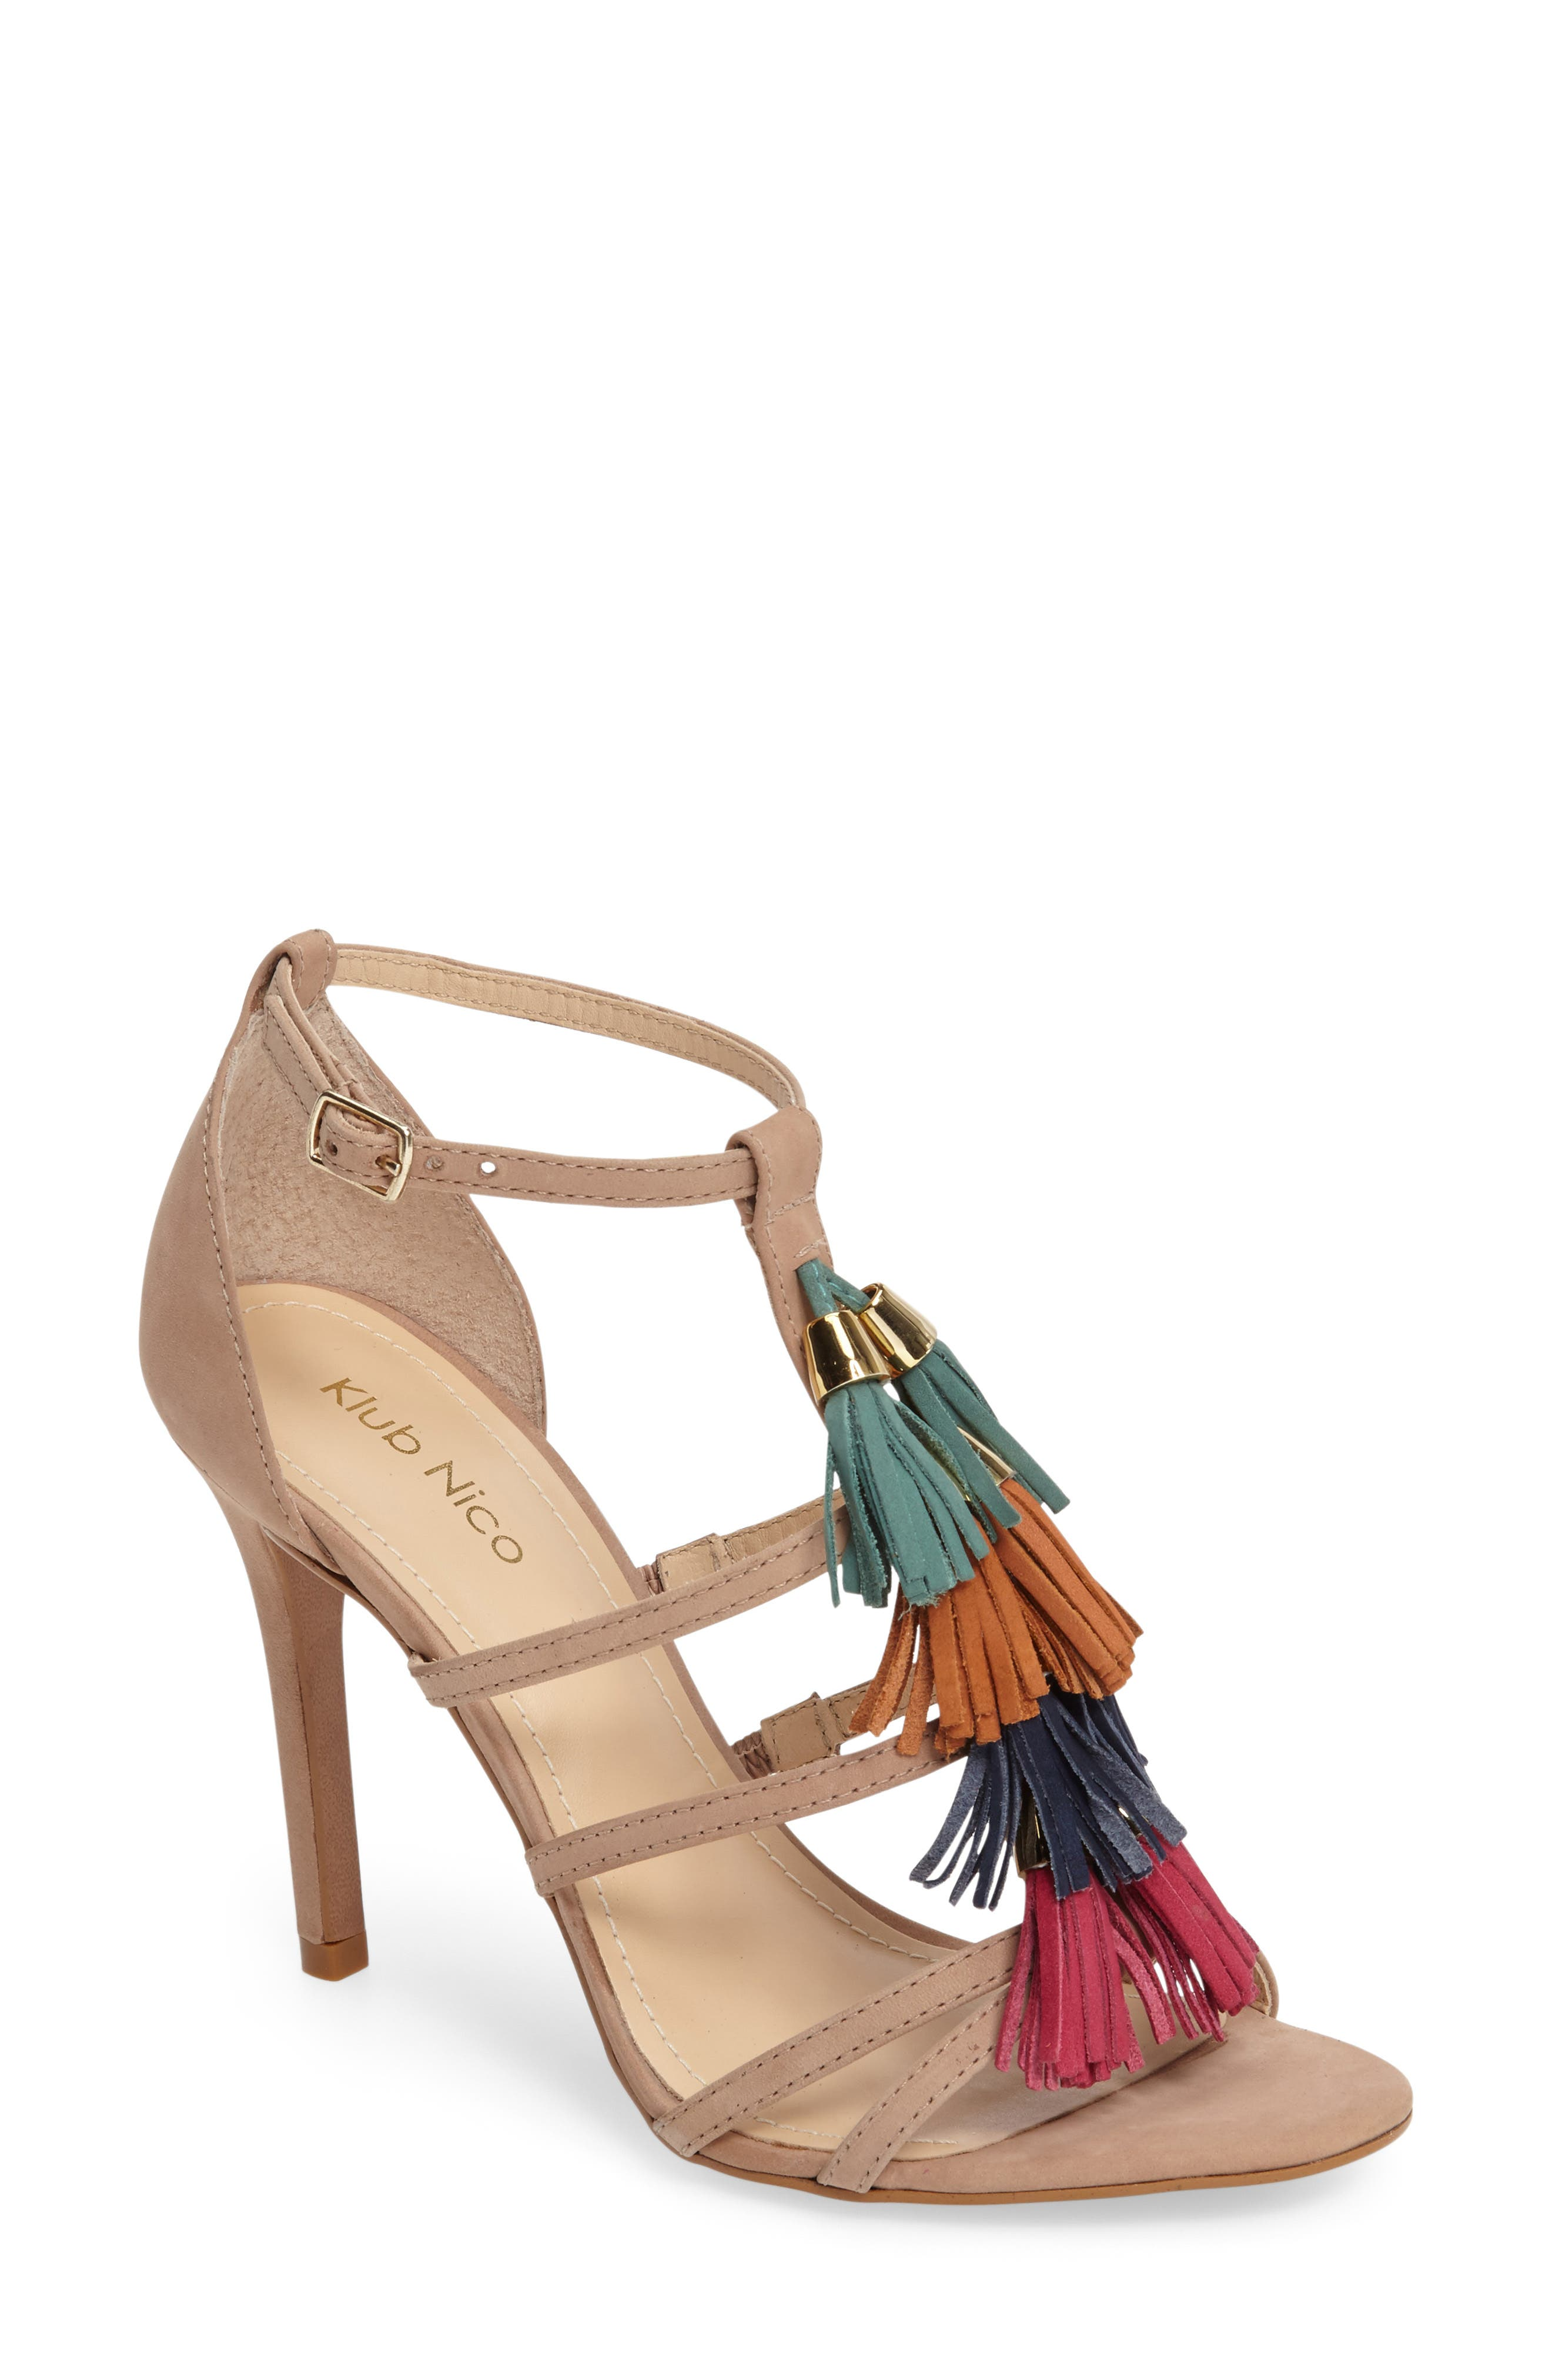 Alternate Image 1 Selected - Klub Nico Myra Tassel Sandal (Women)